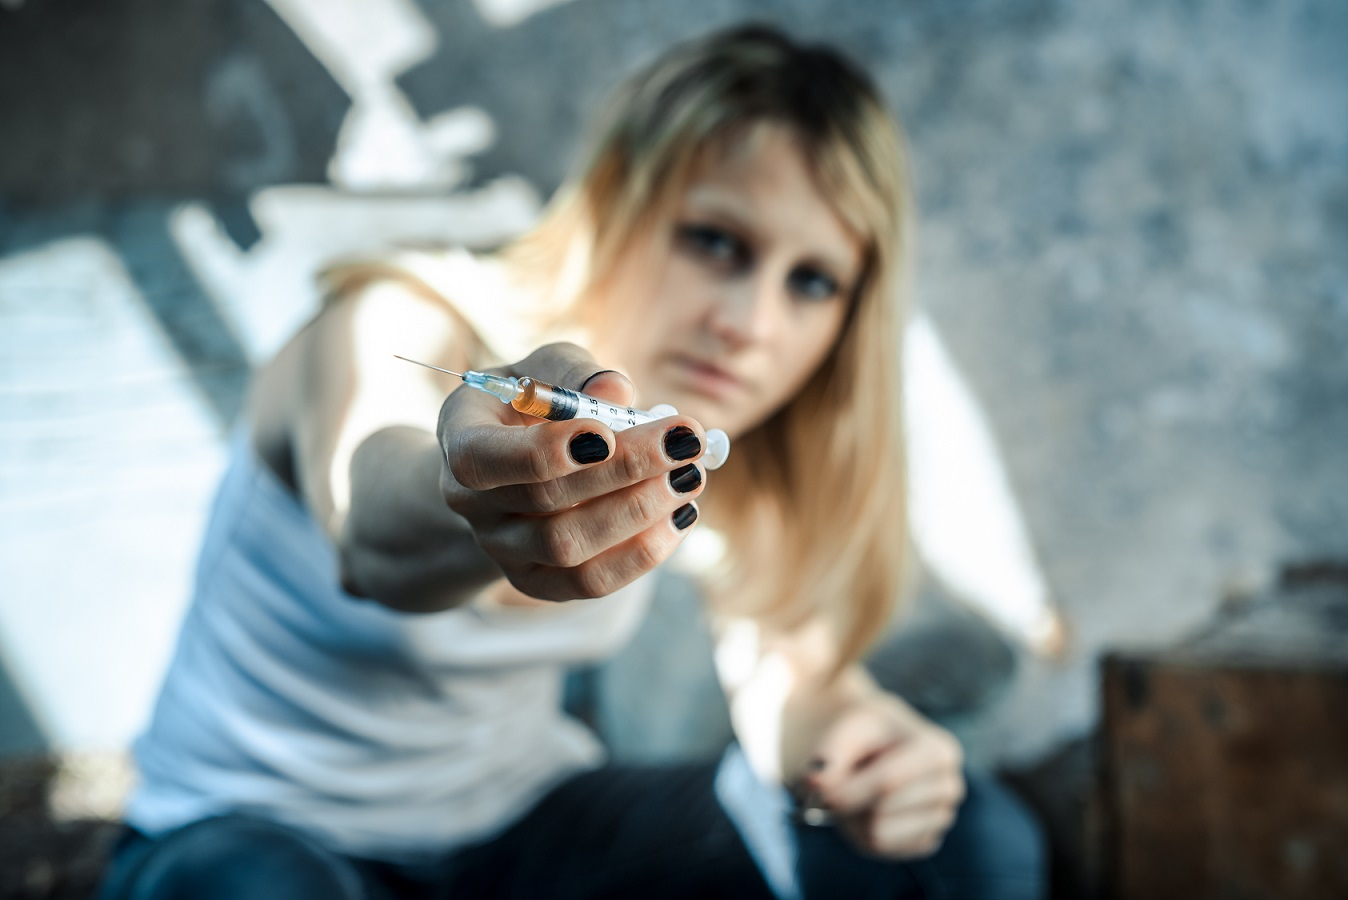 woman offering syringe